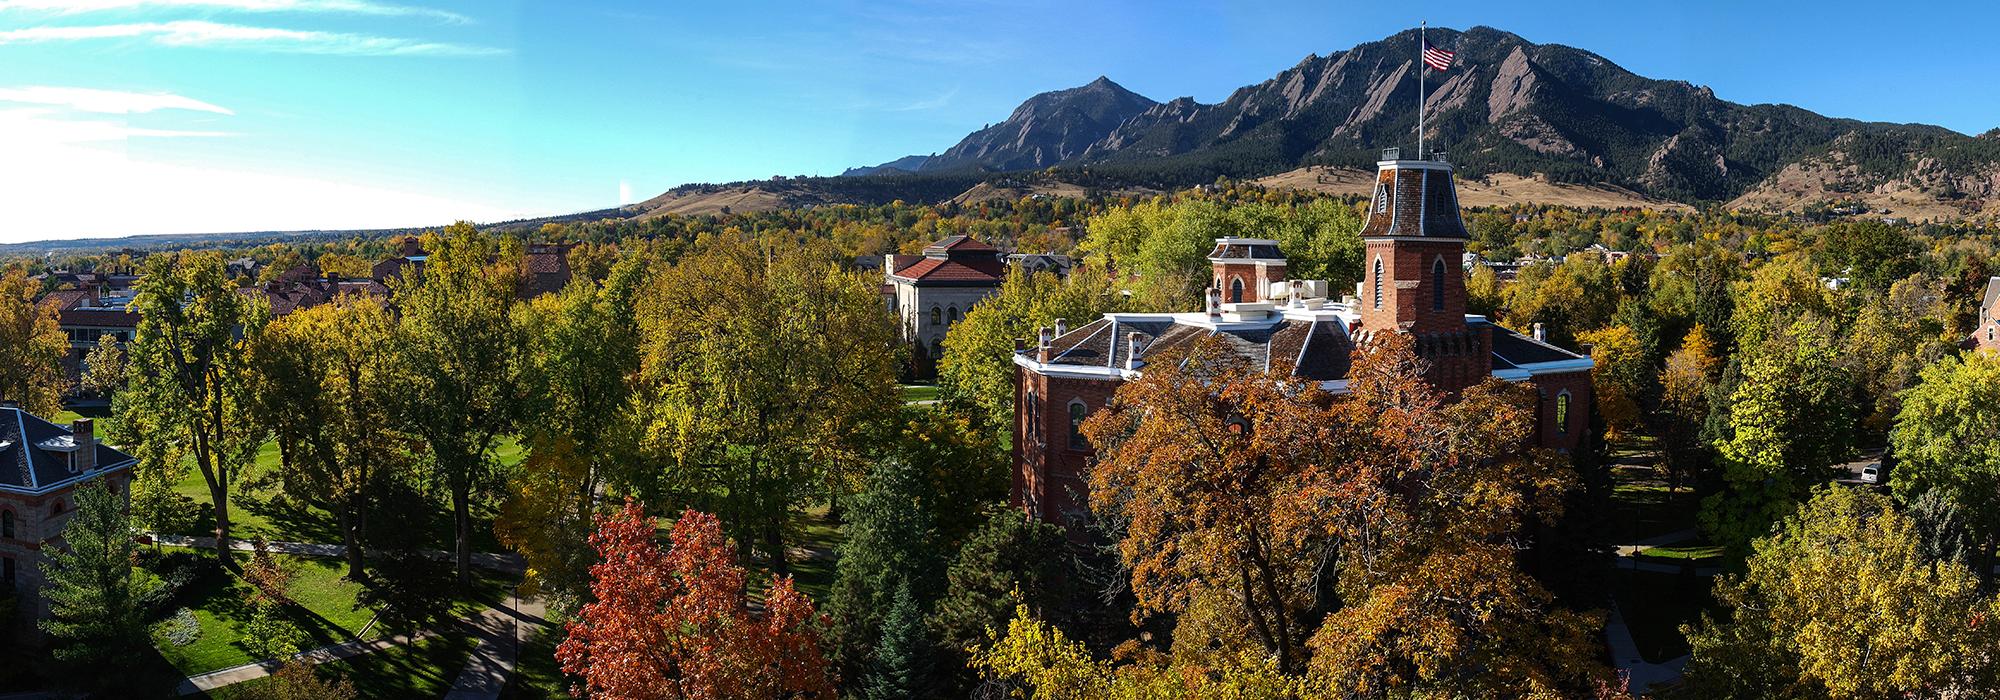 ForeverGold is a community of CU Boulder alumni